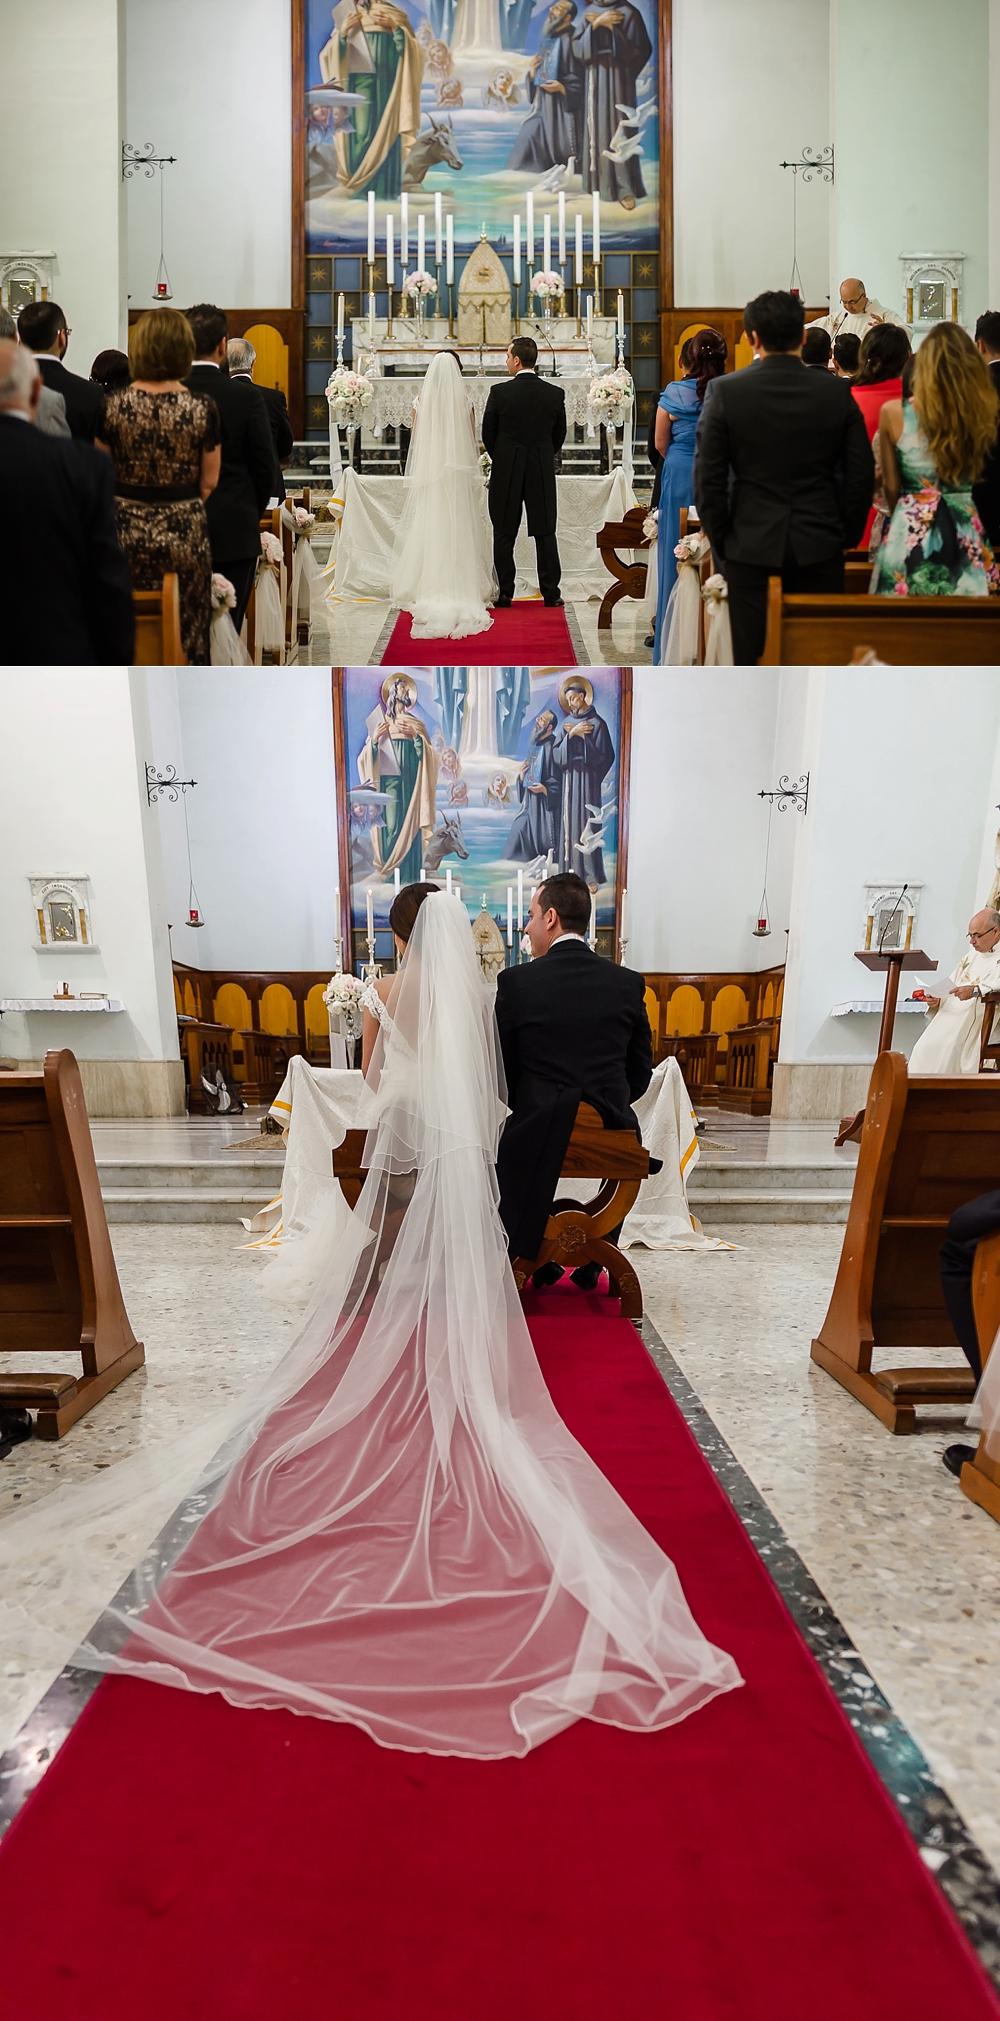 Maria & Fiobian - Excelsior Floriana - Wedding Photography Malta